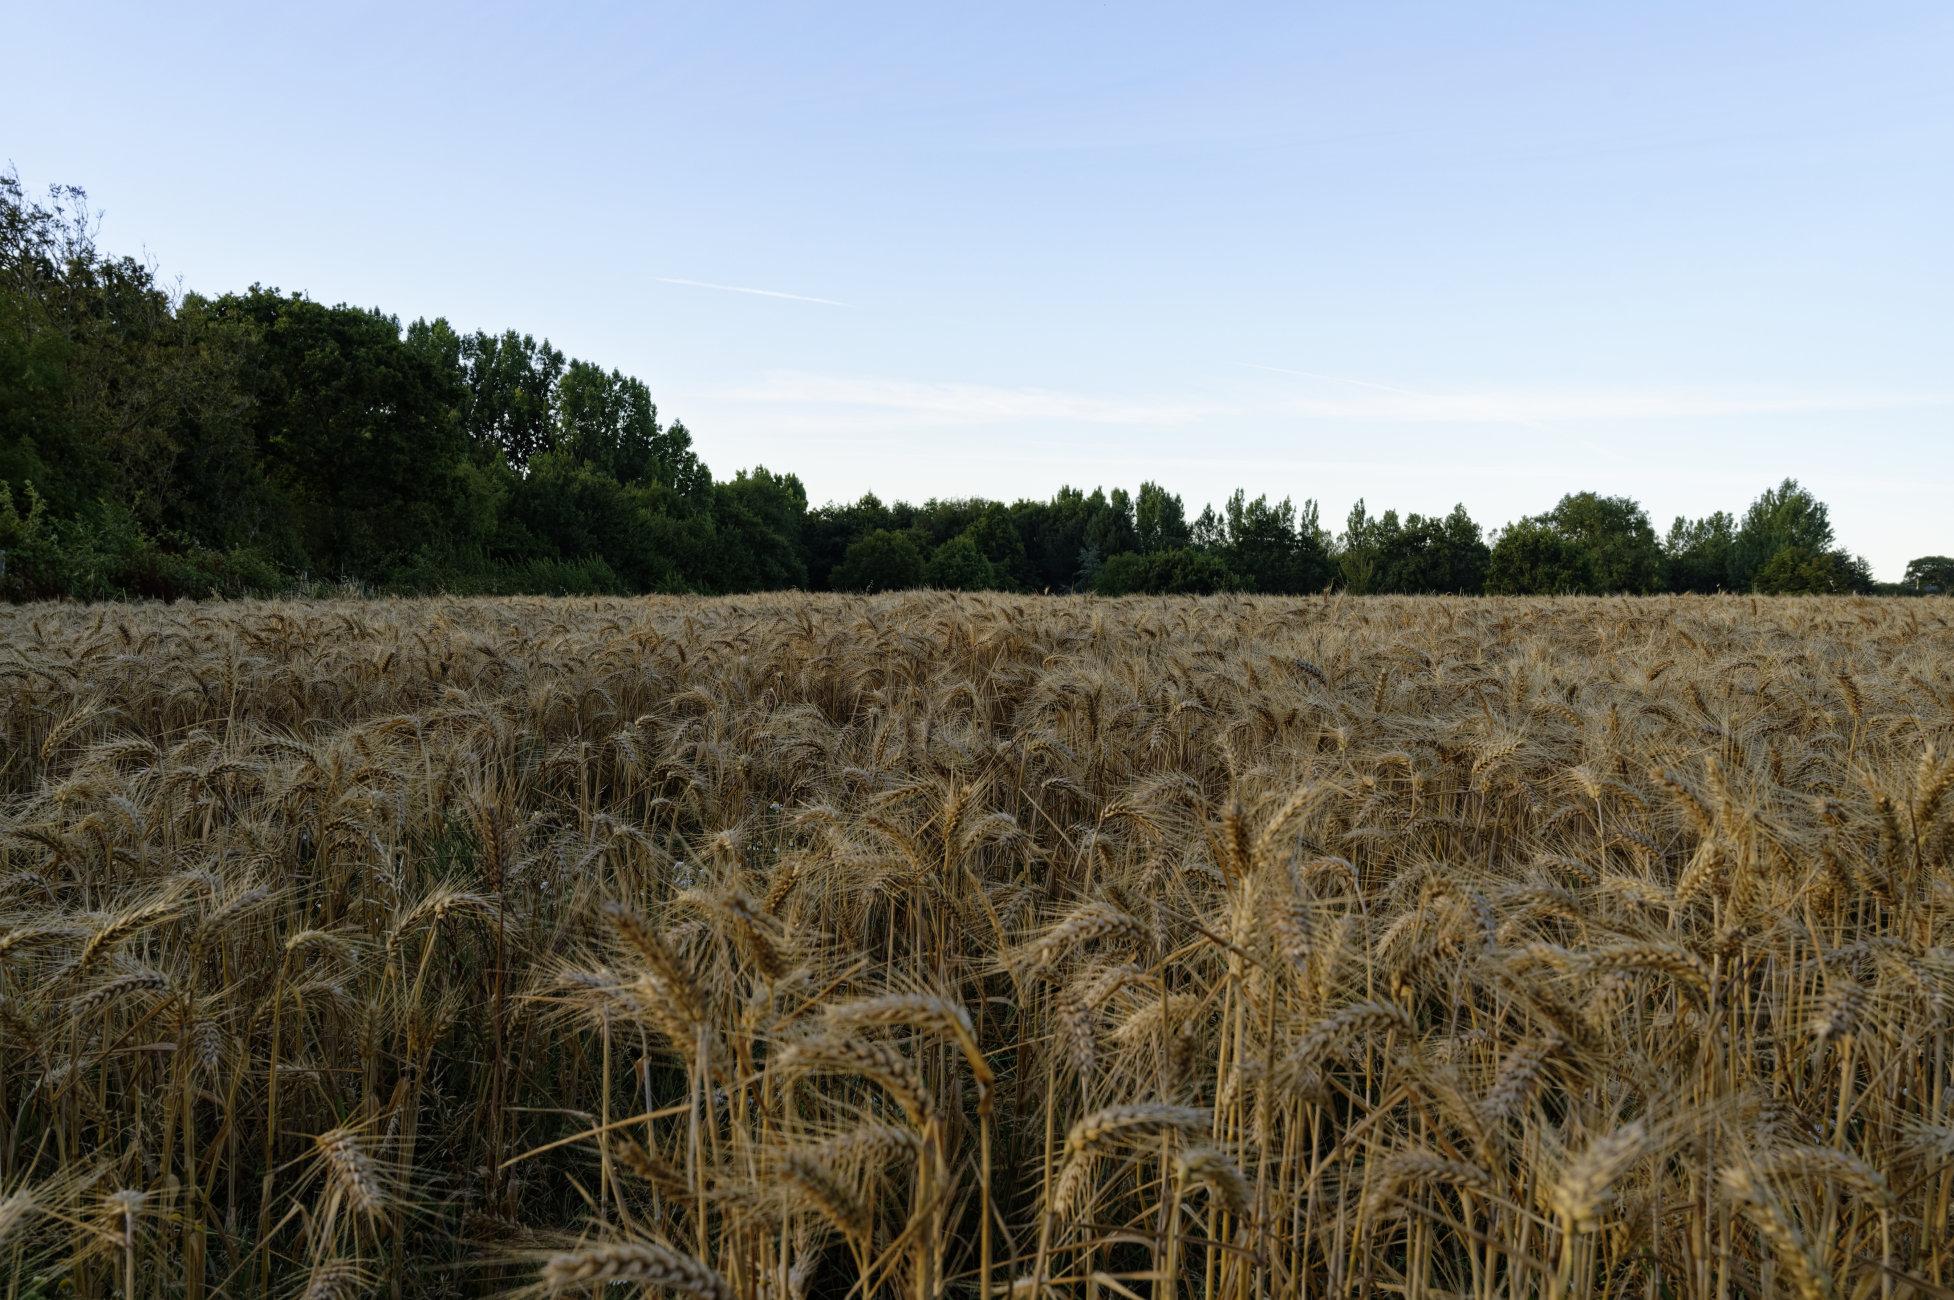 Field's of barley.